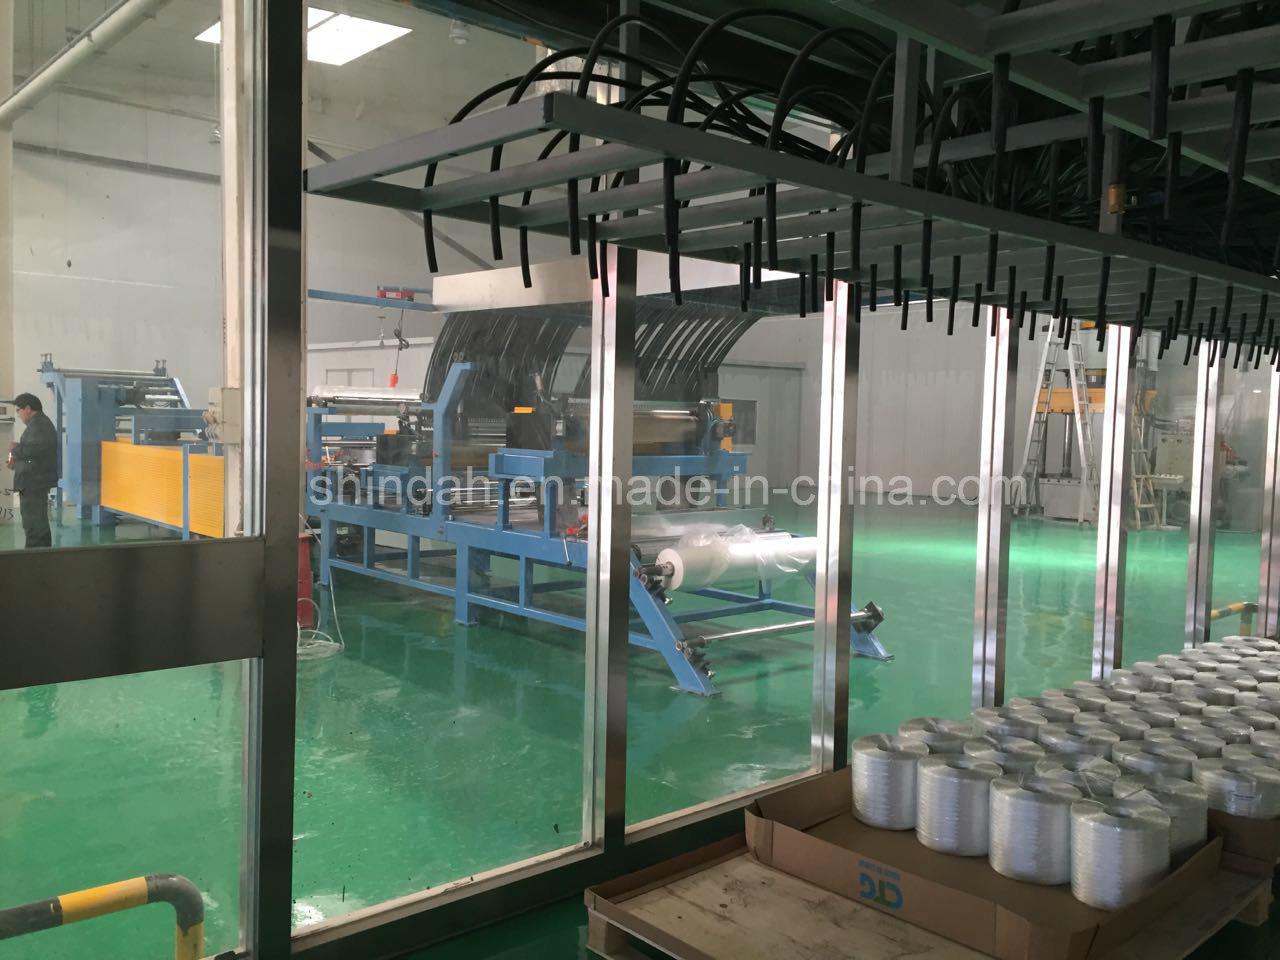 SMC Prepreg Production Line/SMC Machine